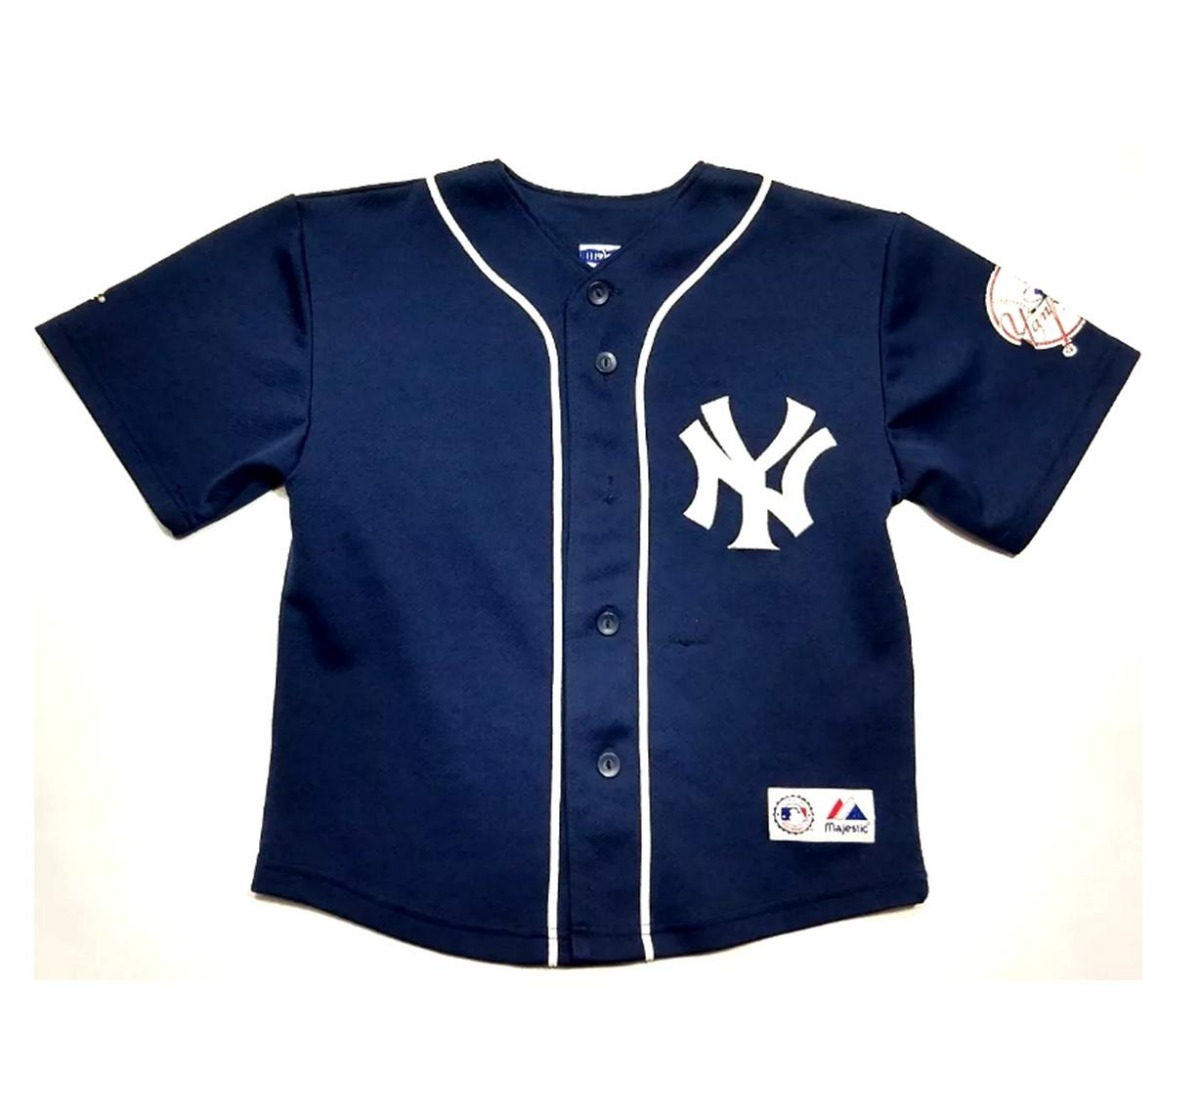 6299d8d7a casaca baseball new york yankees niño majestic jeter 2. Cargando zoom.